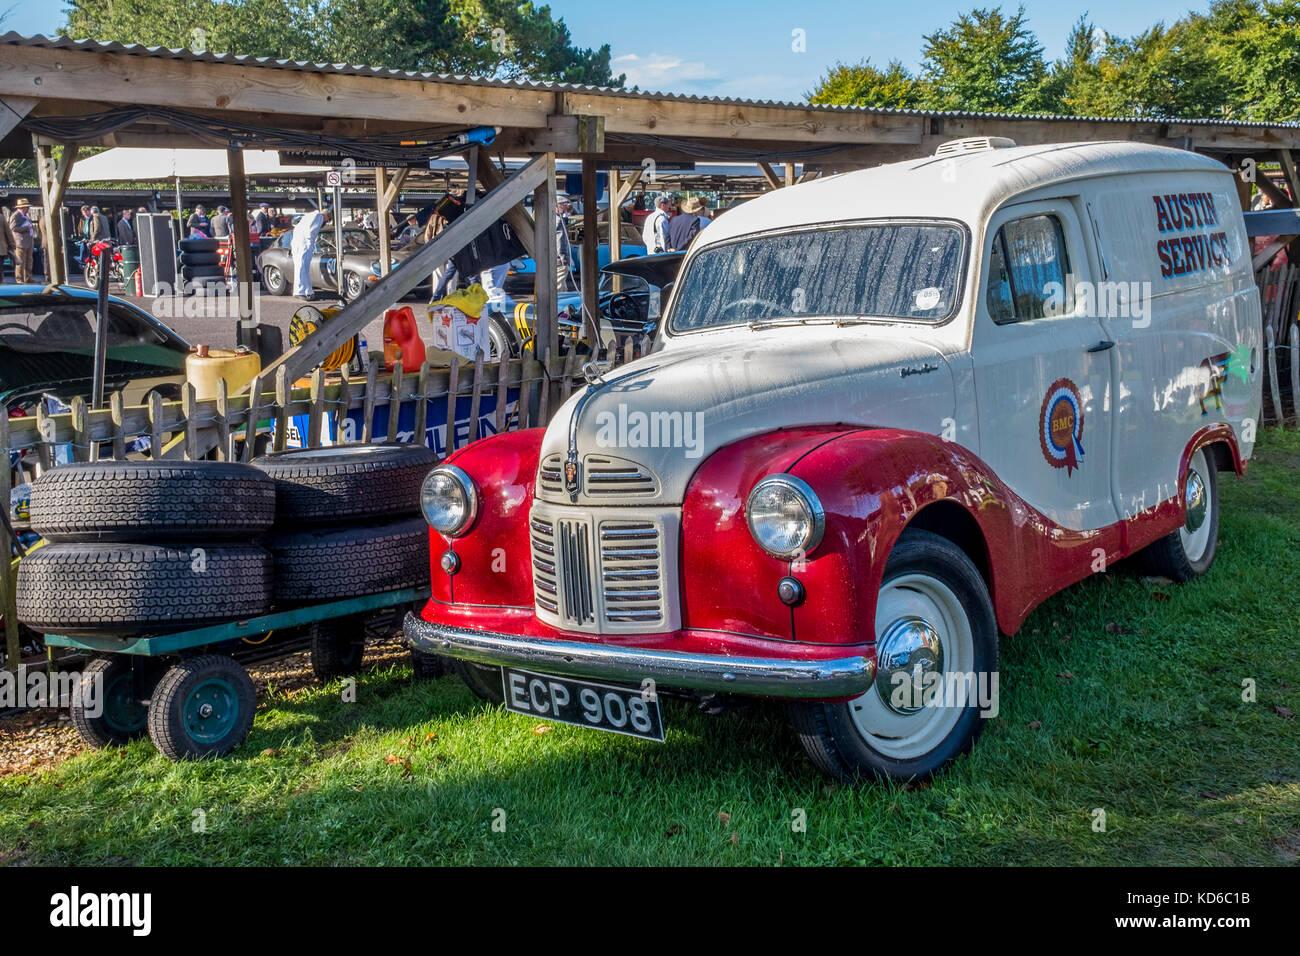 1954 Austin A40 Van, Ecp 908, Am Goodwood Revival 2017, Sussex, UK. Stockbild